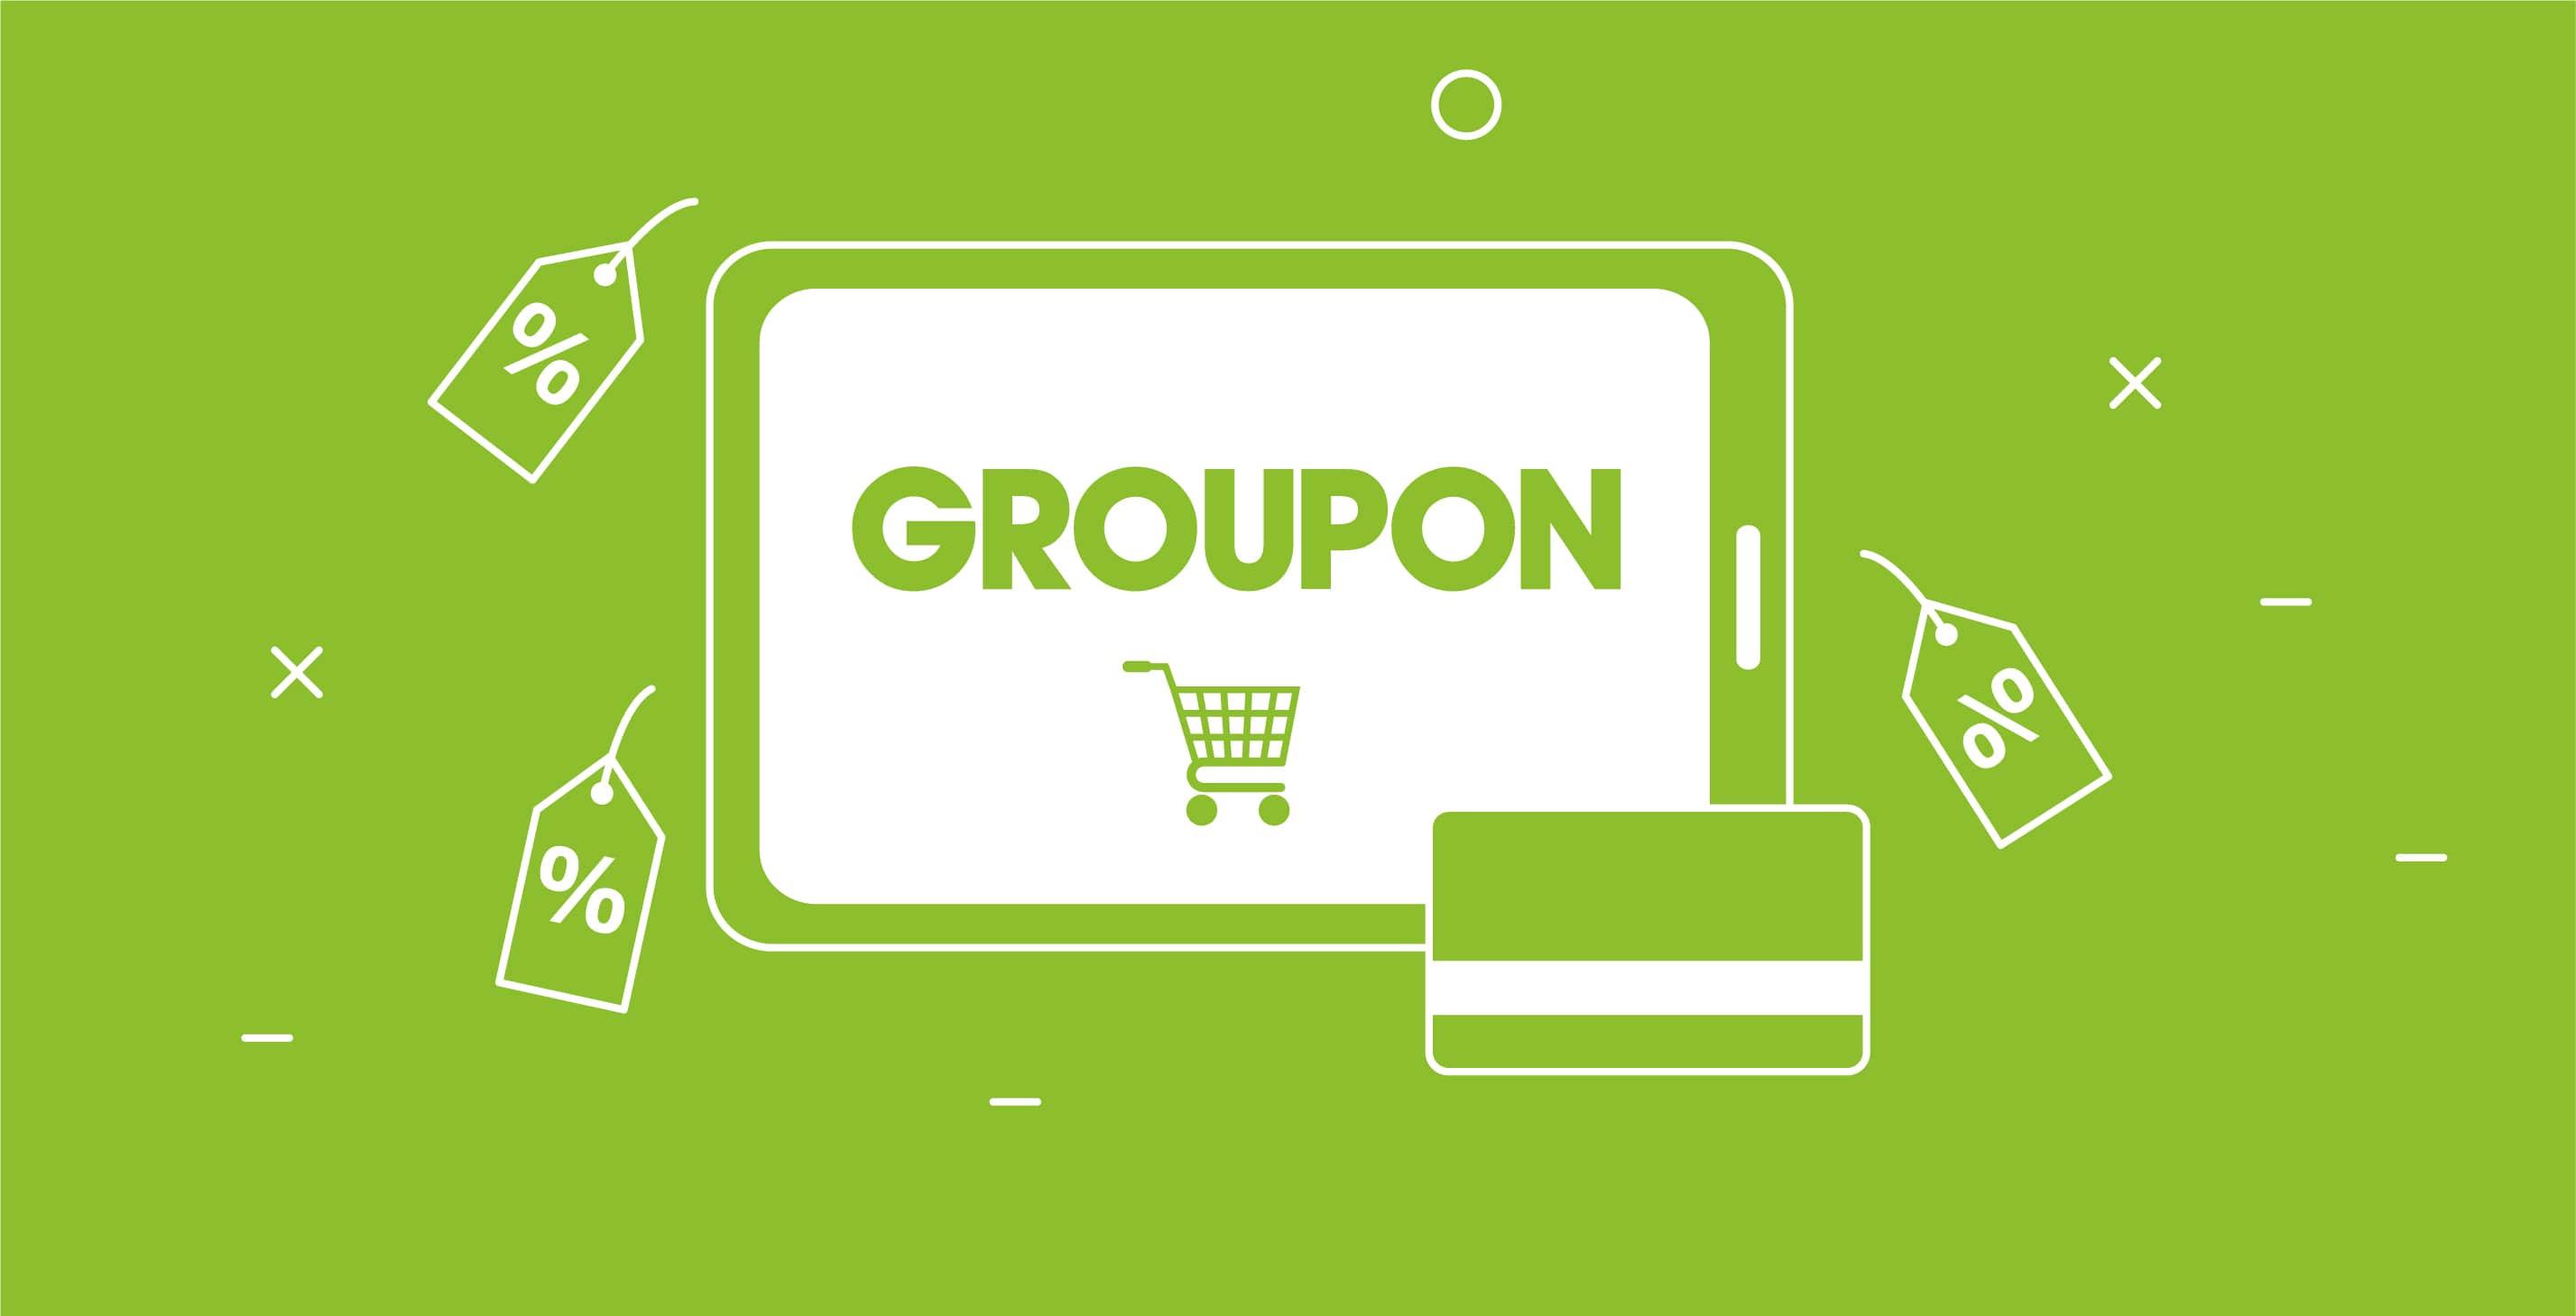 groupon tra i migliori ecommerce